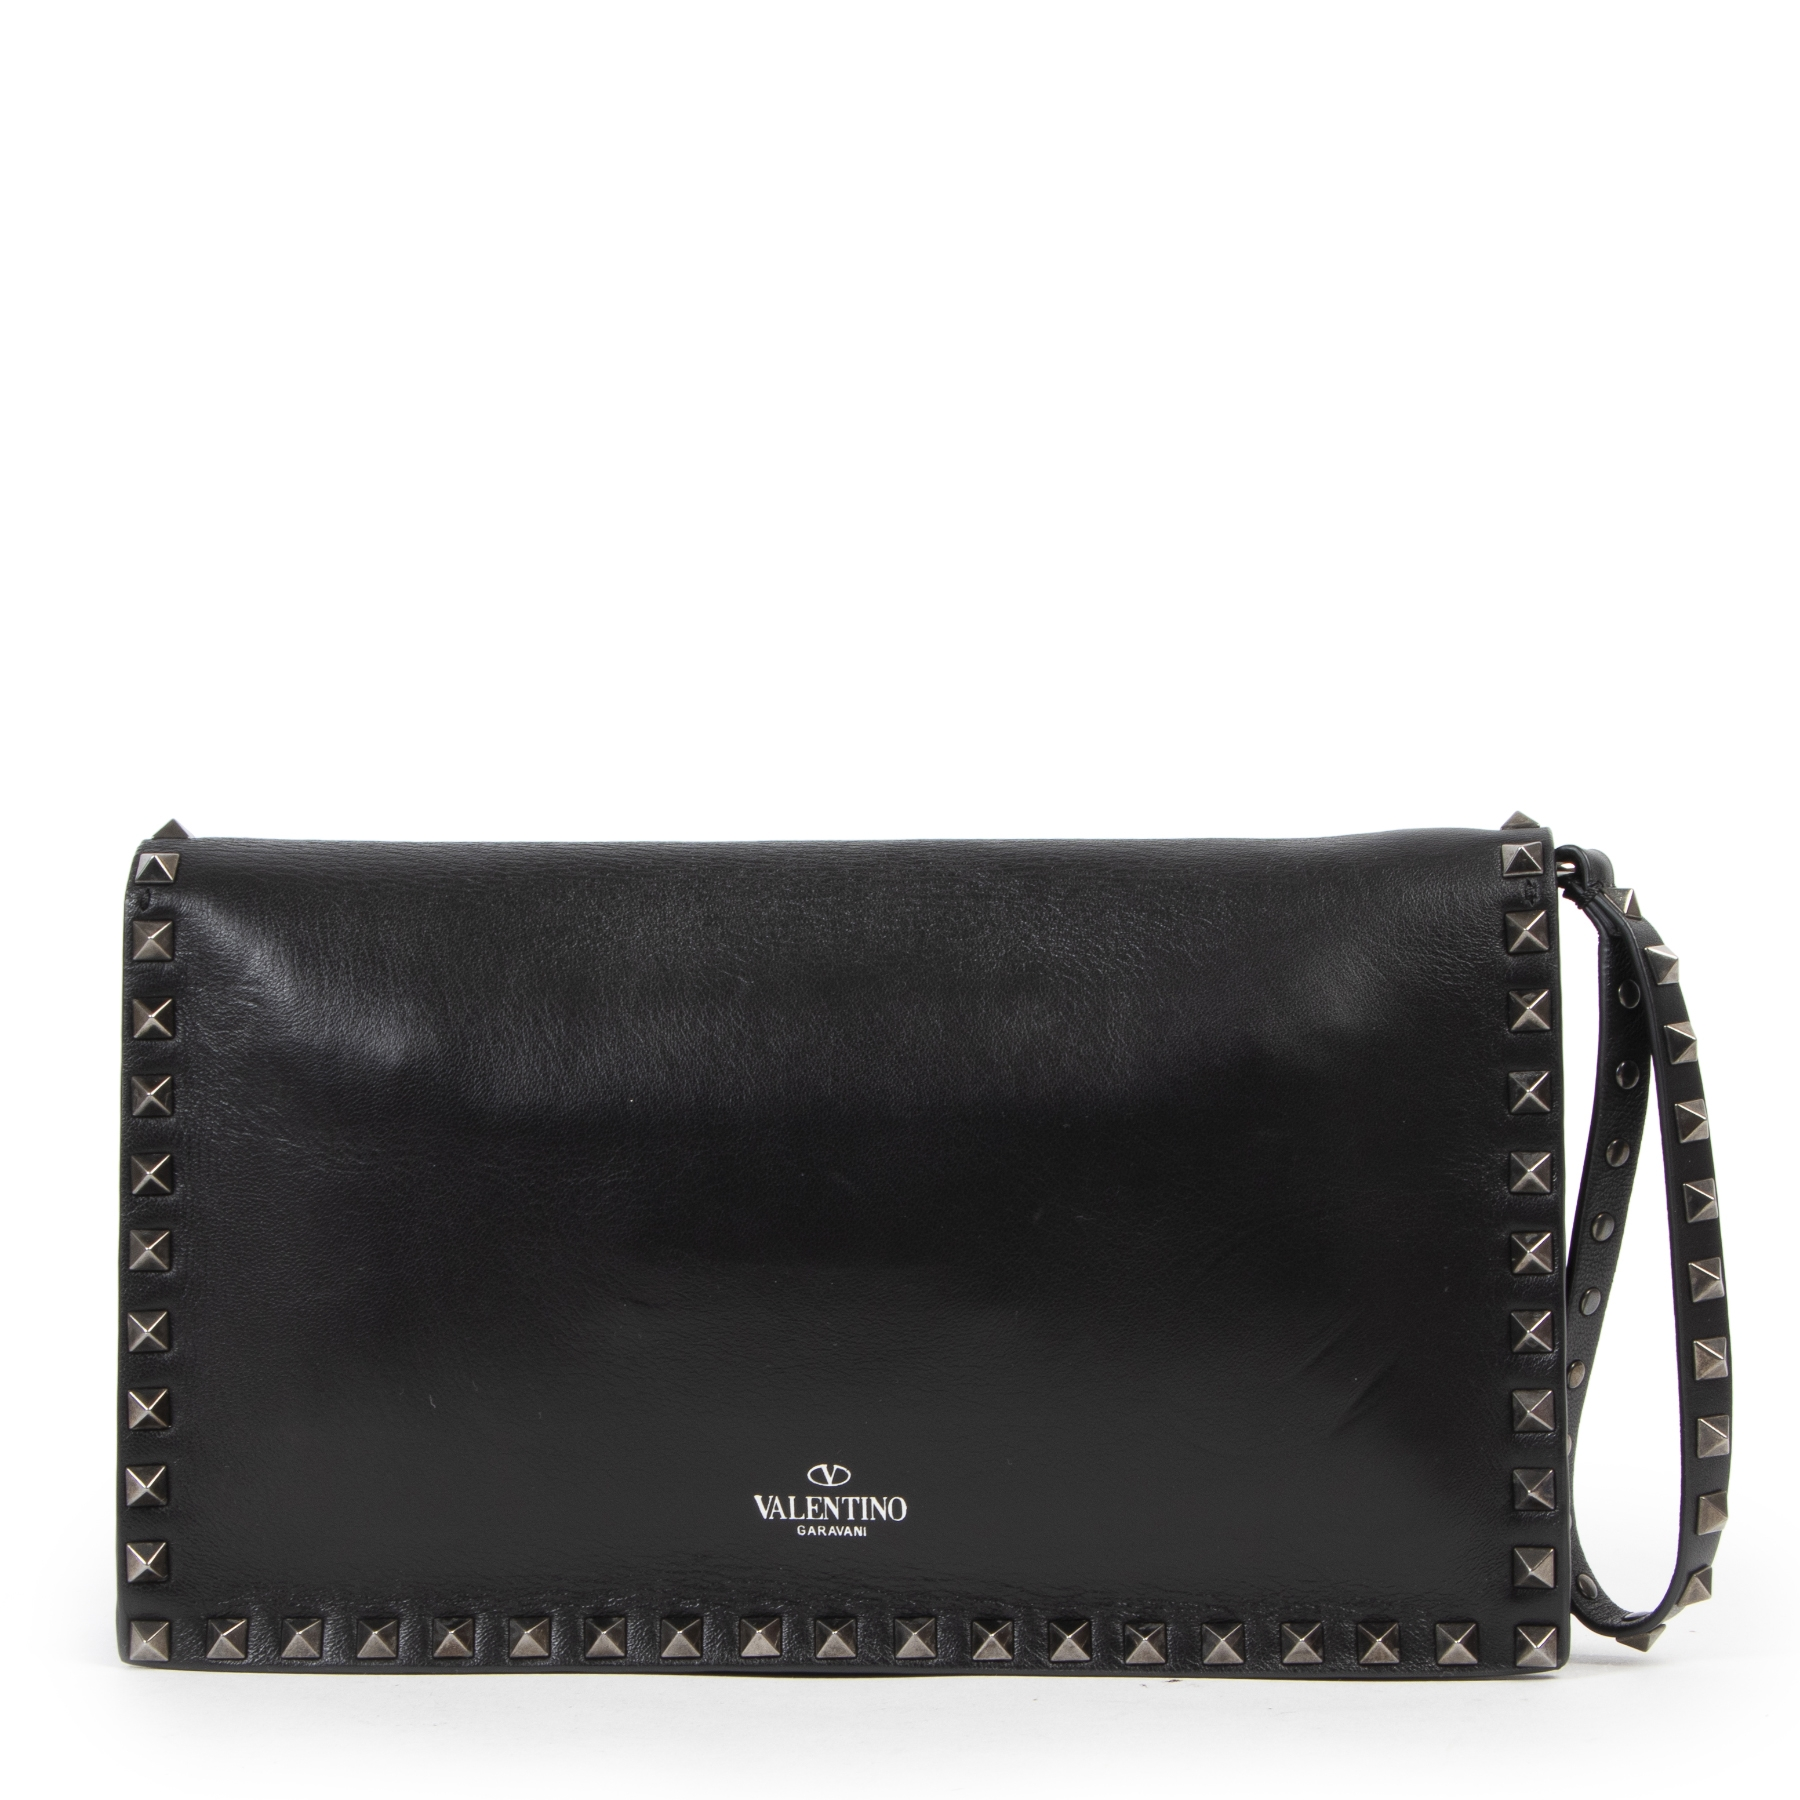 shop safe online Valentino Garavani All Black Rockstud Clutch